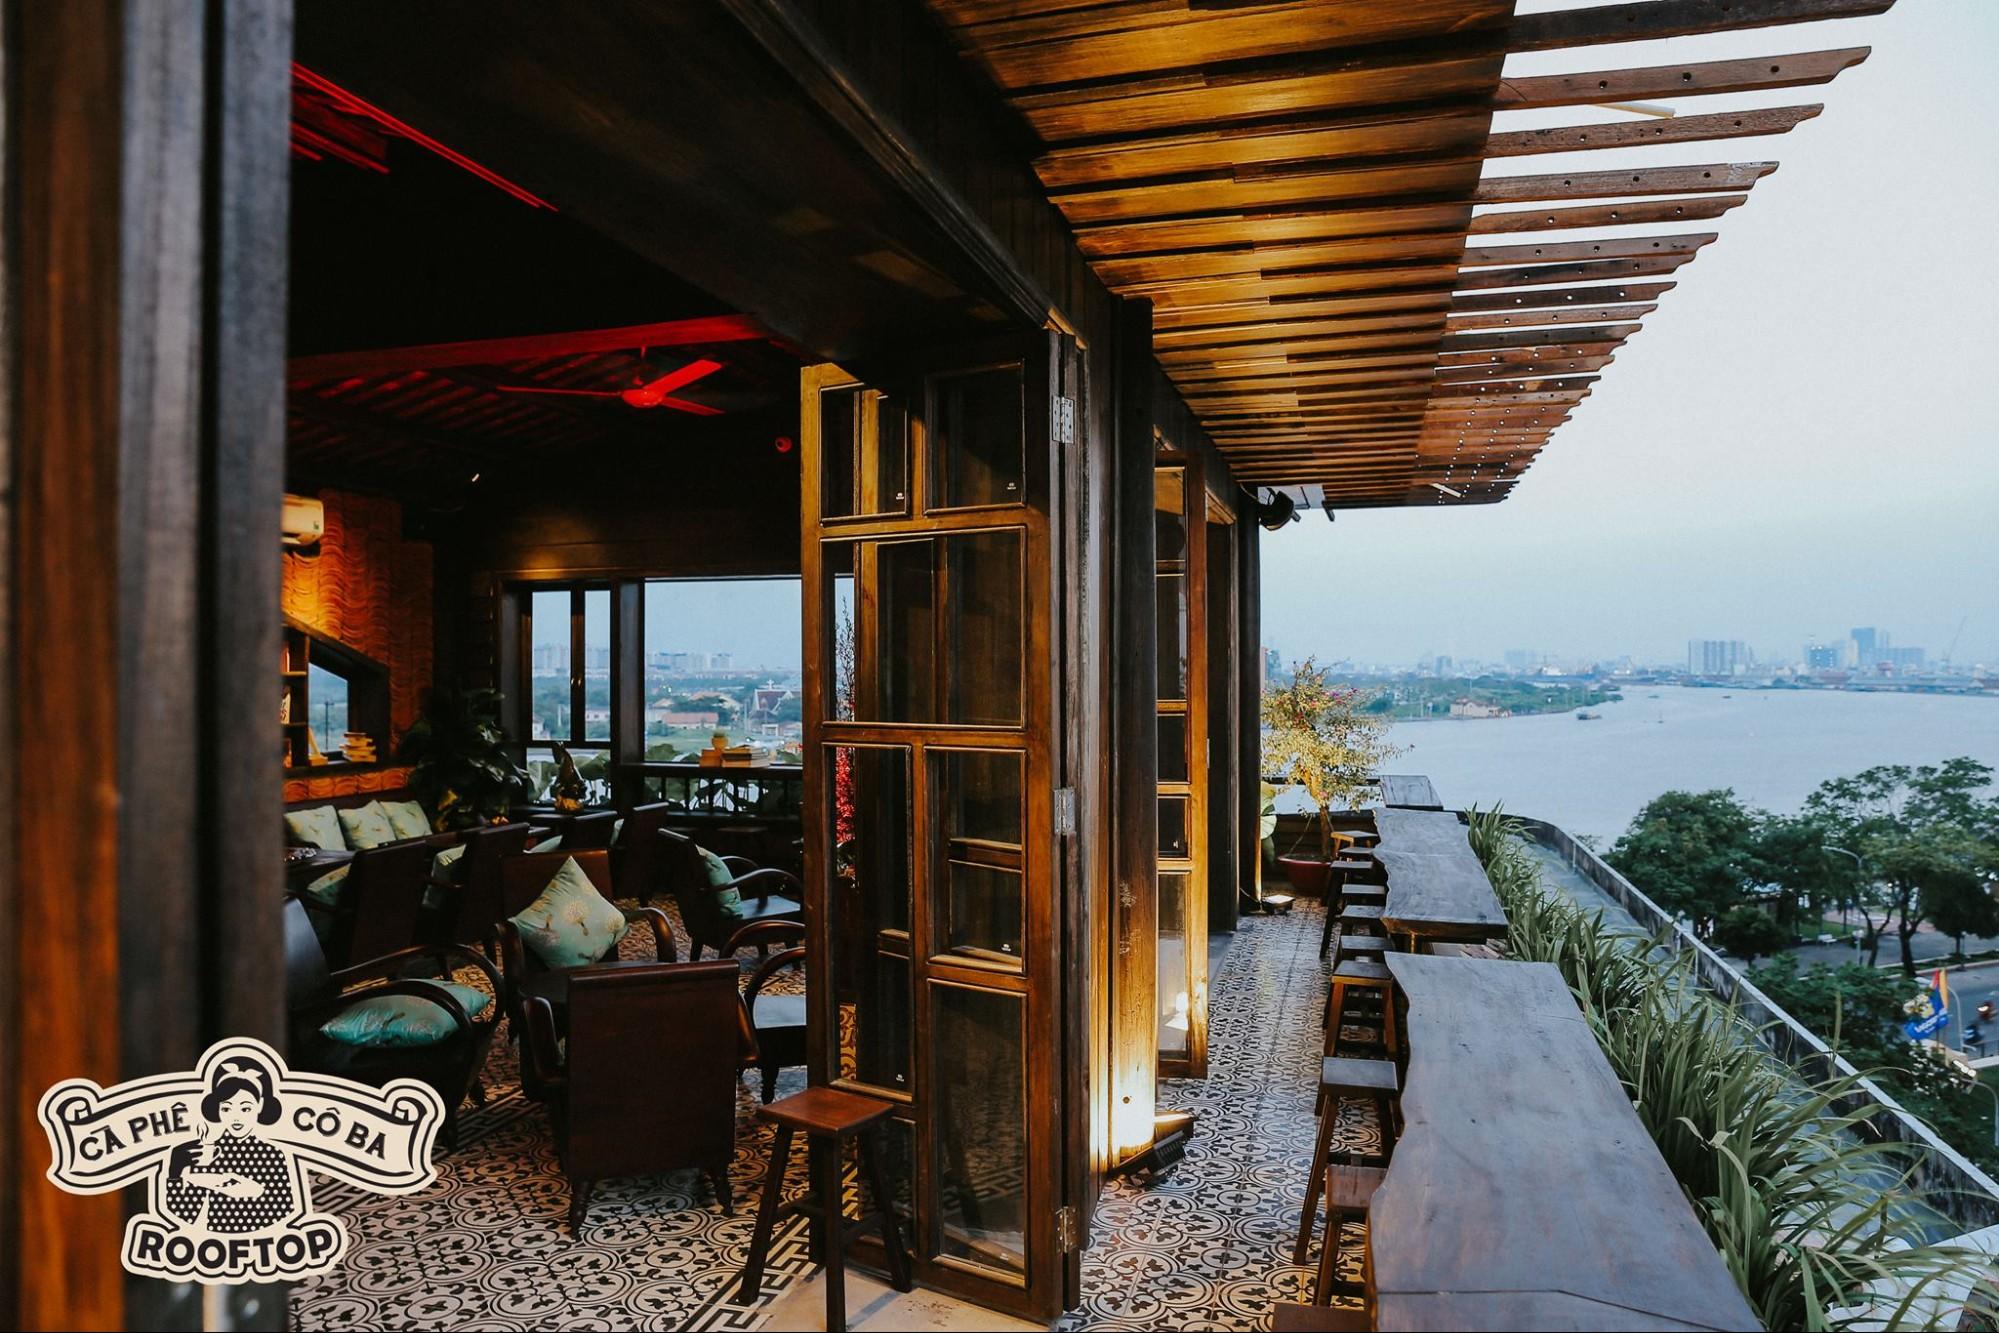 co ba dong khoi rooftop café